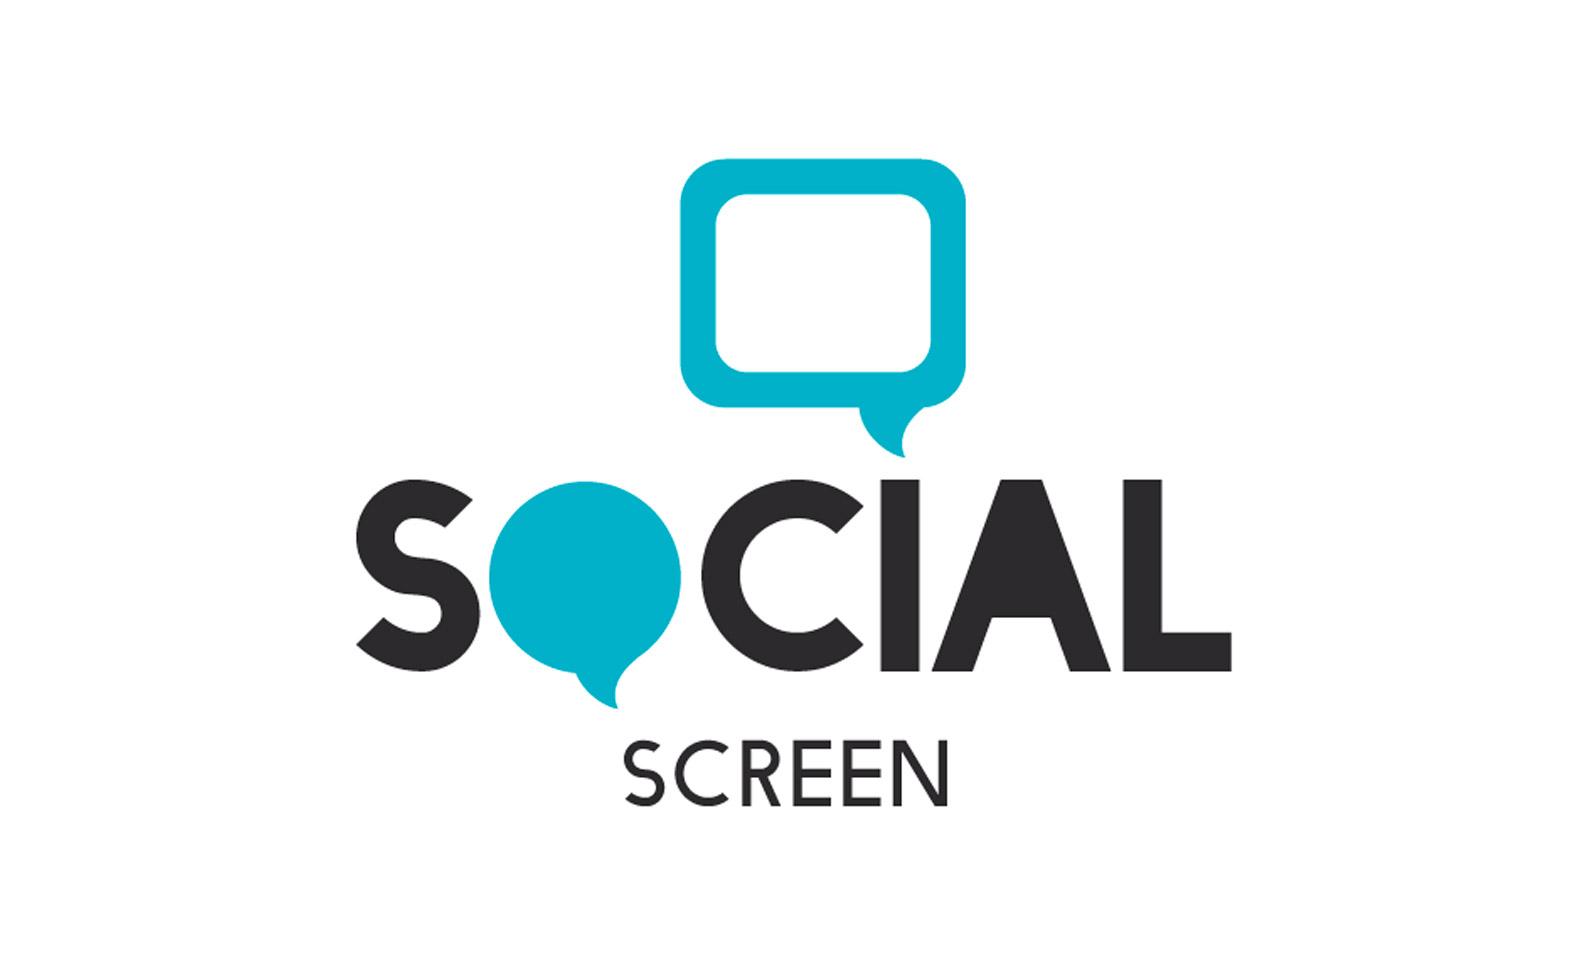 Social Screen